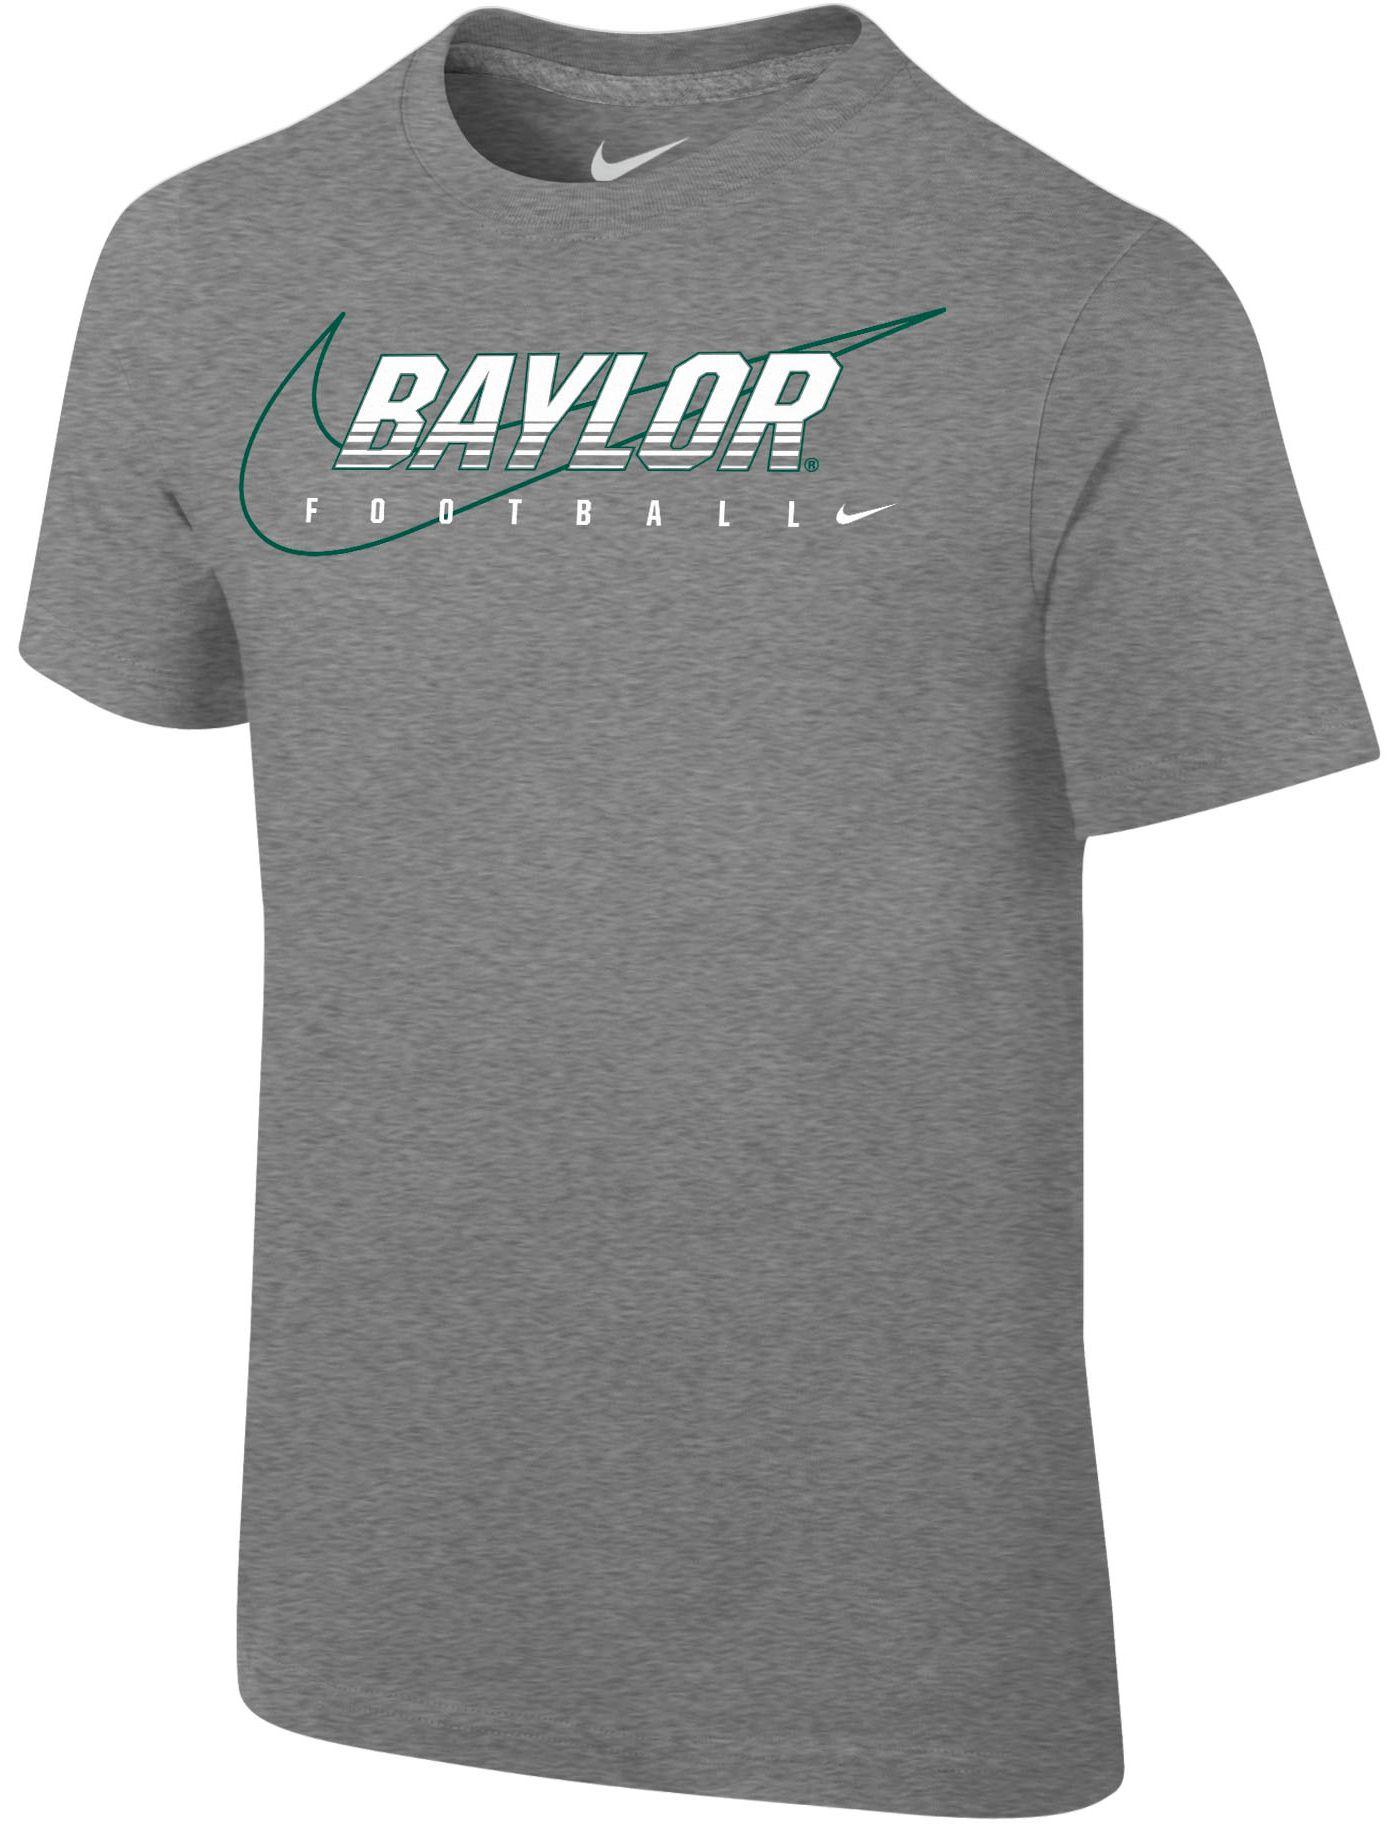 Nike Youth Baylor Bears Grey Football Dri-FIT Cotton Preschool Facility T-Shirt